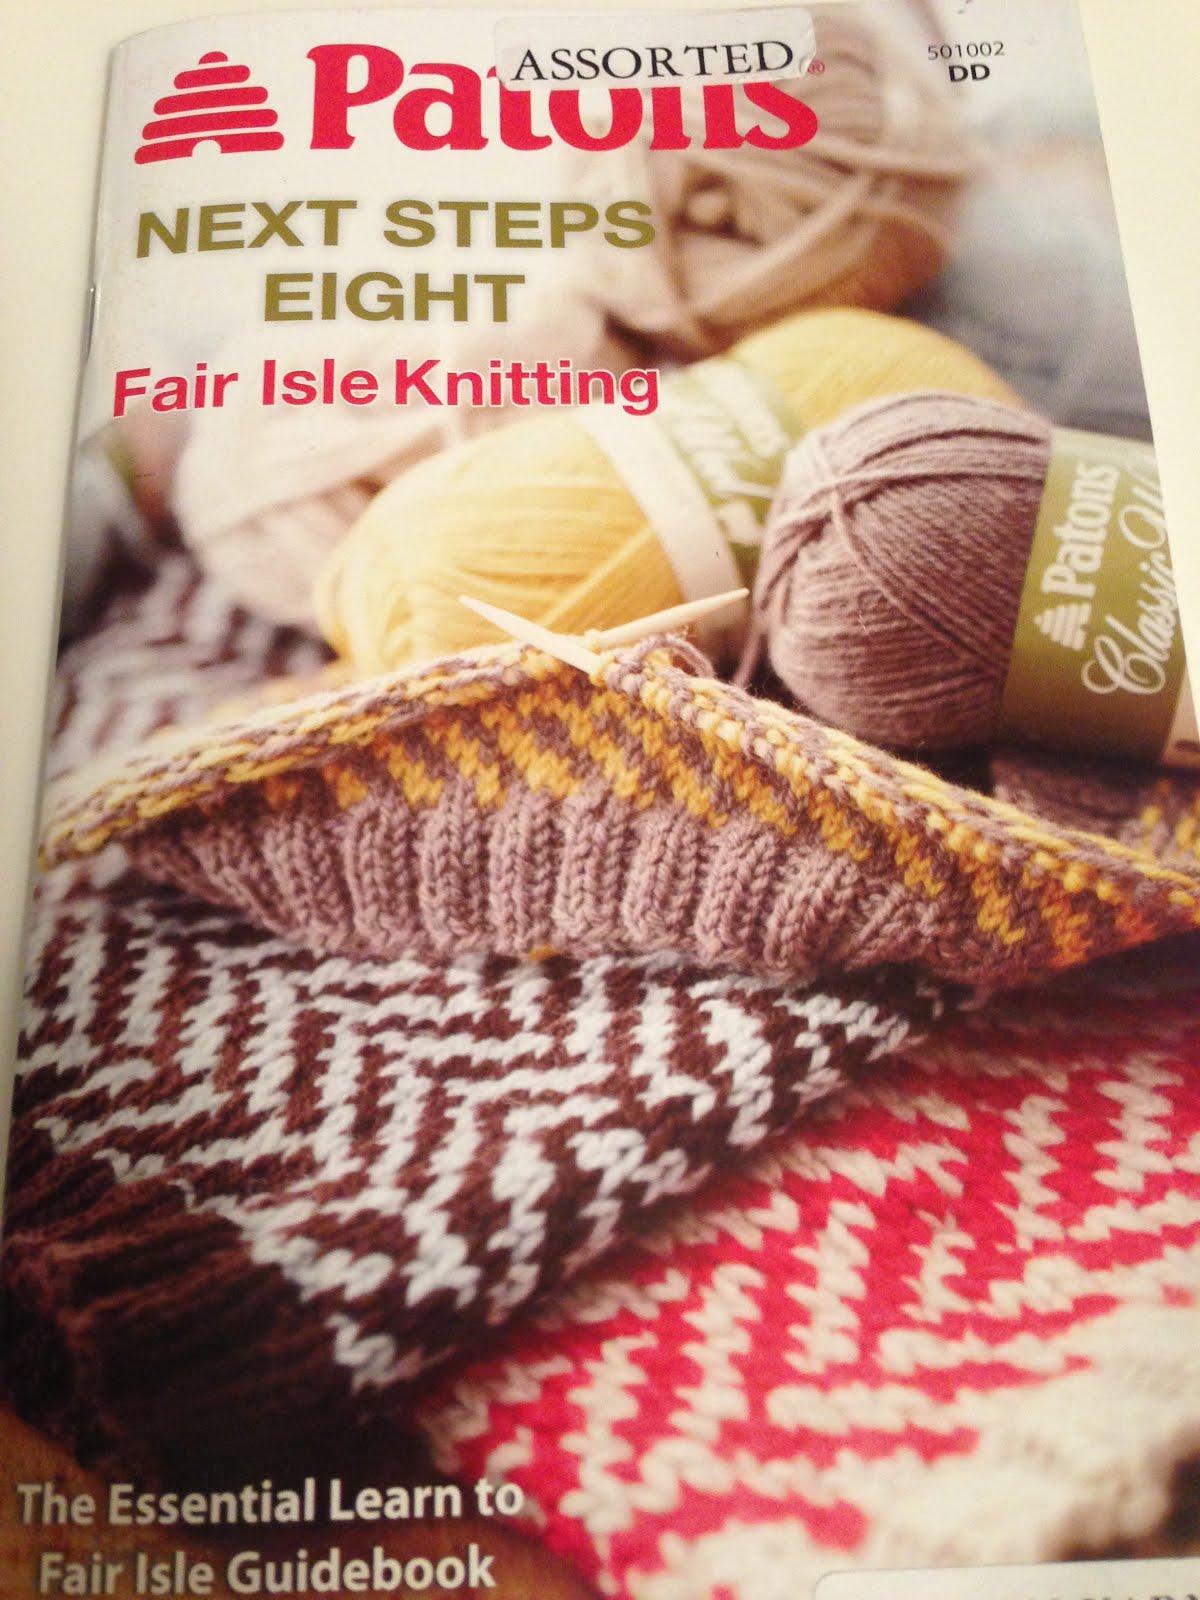 Wildflower Wool Knits: Next Steps - Fair Isle Knitting - 1st Pattern